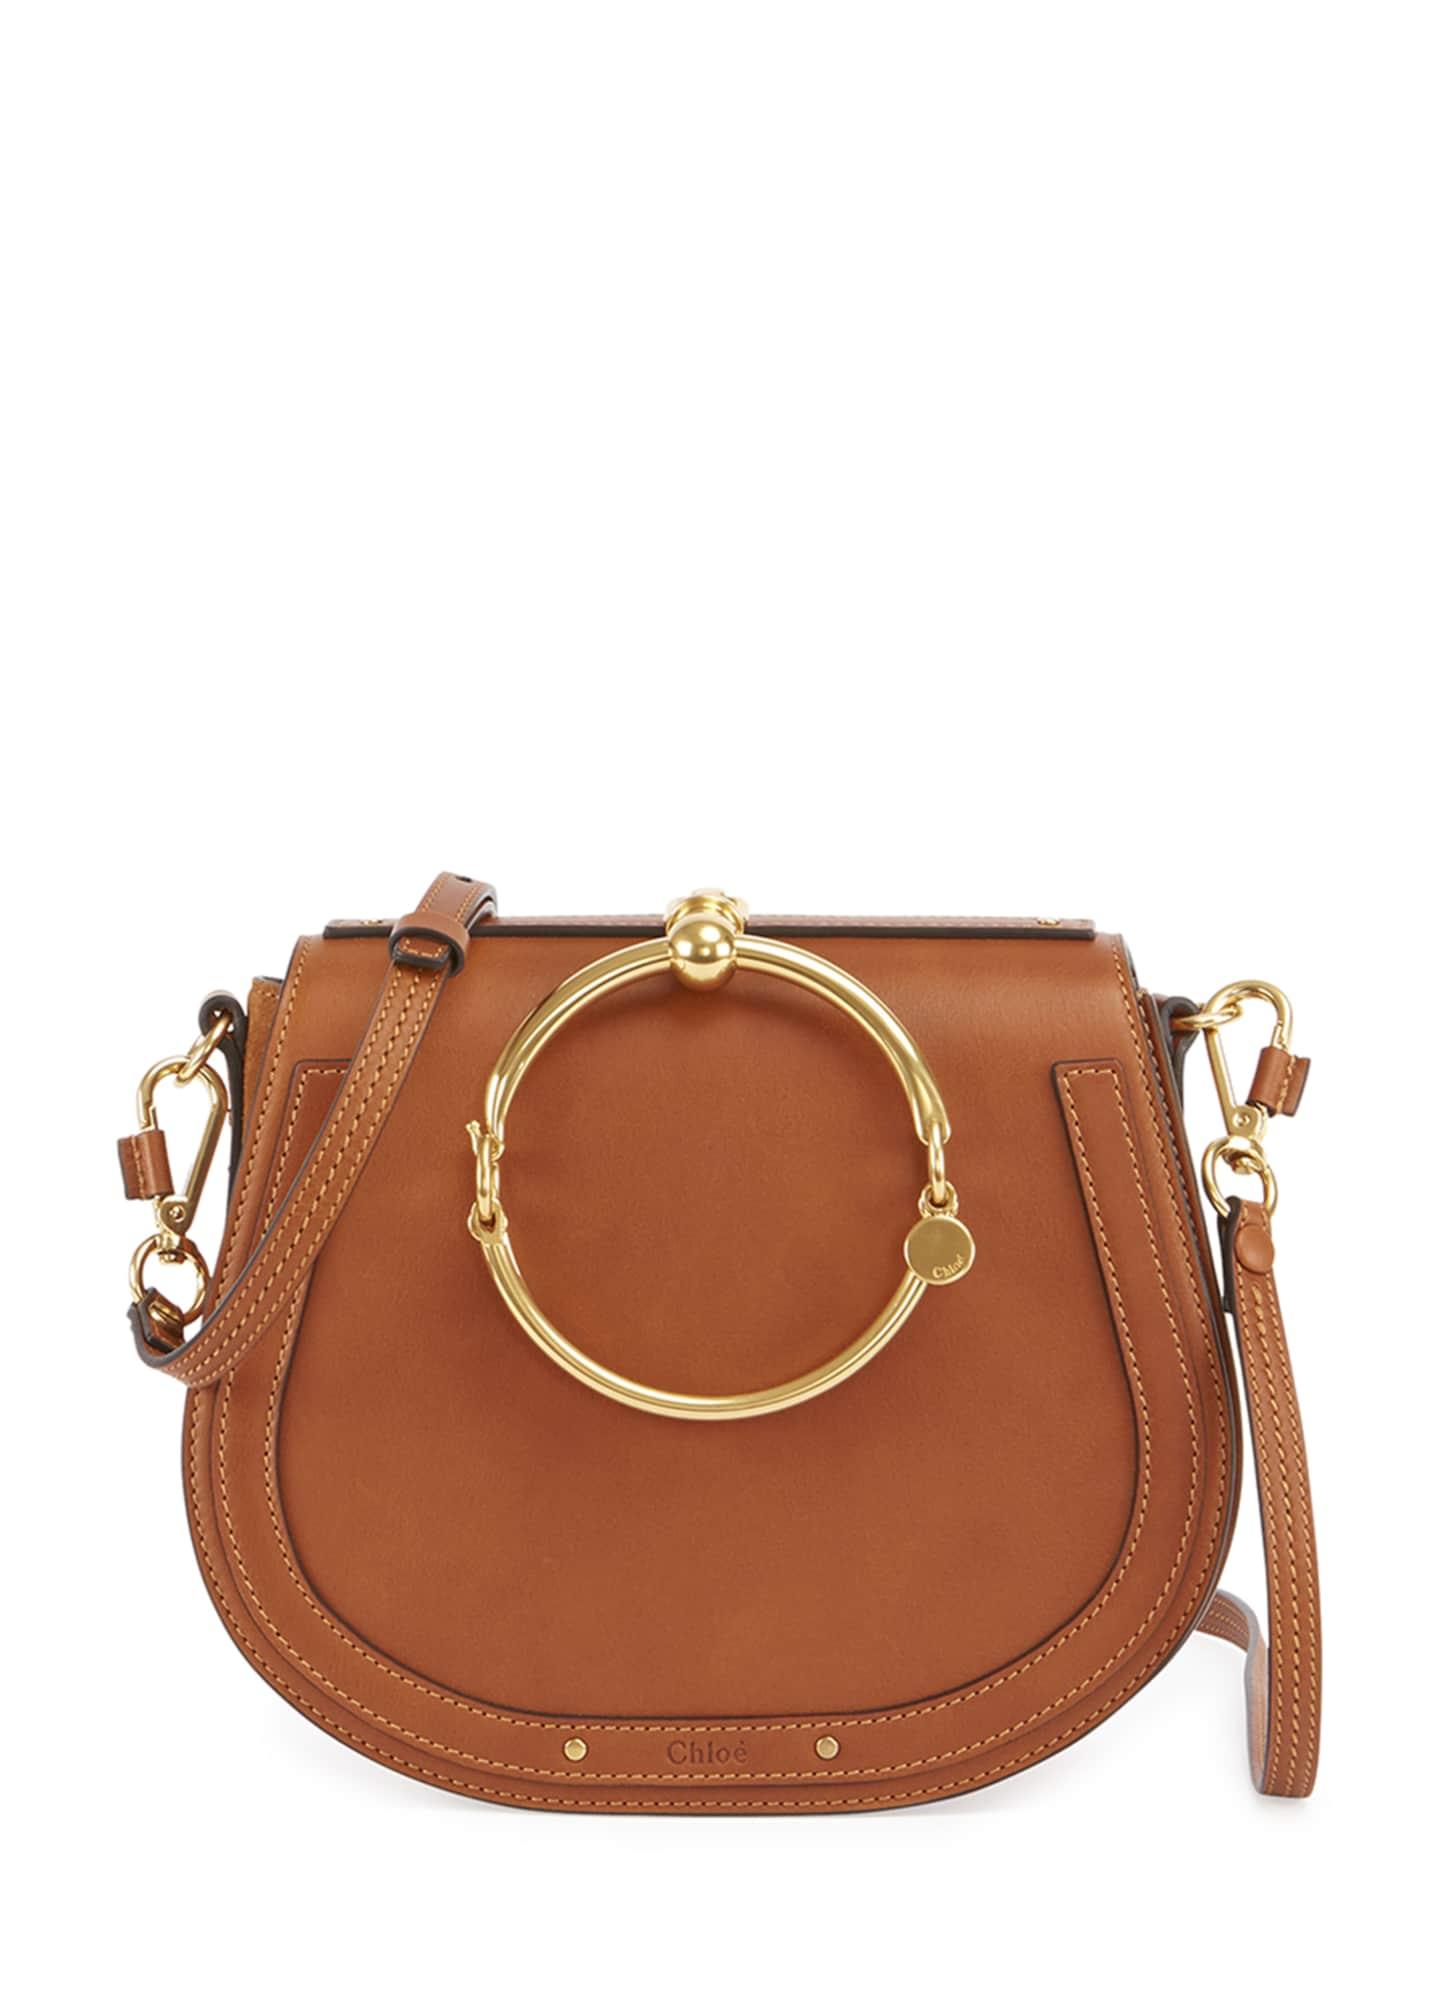 Chloe Nile Medium Bracelet Crossbody Bag